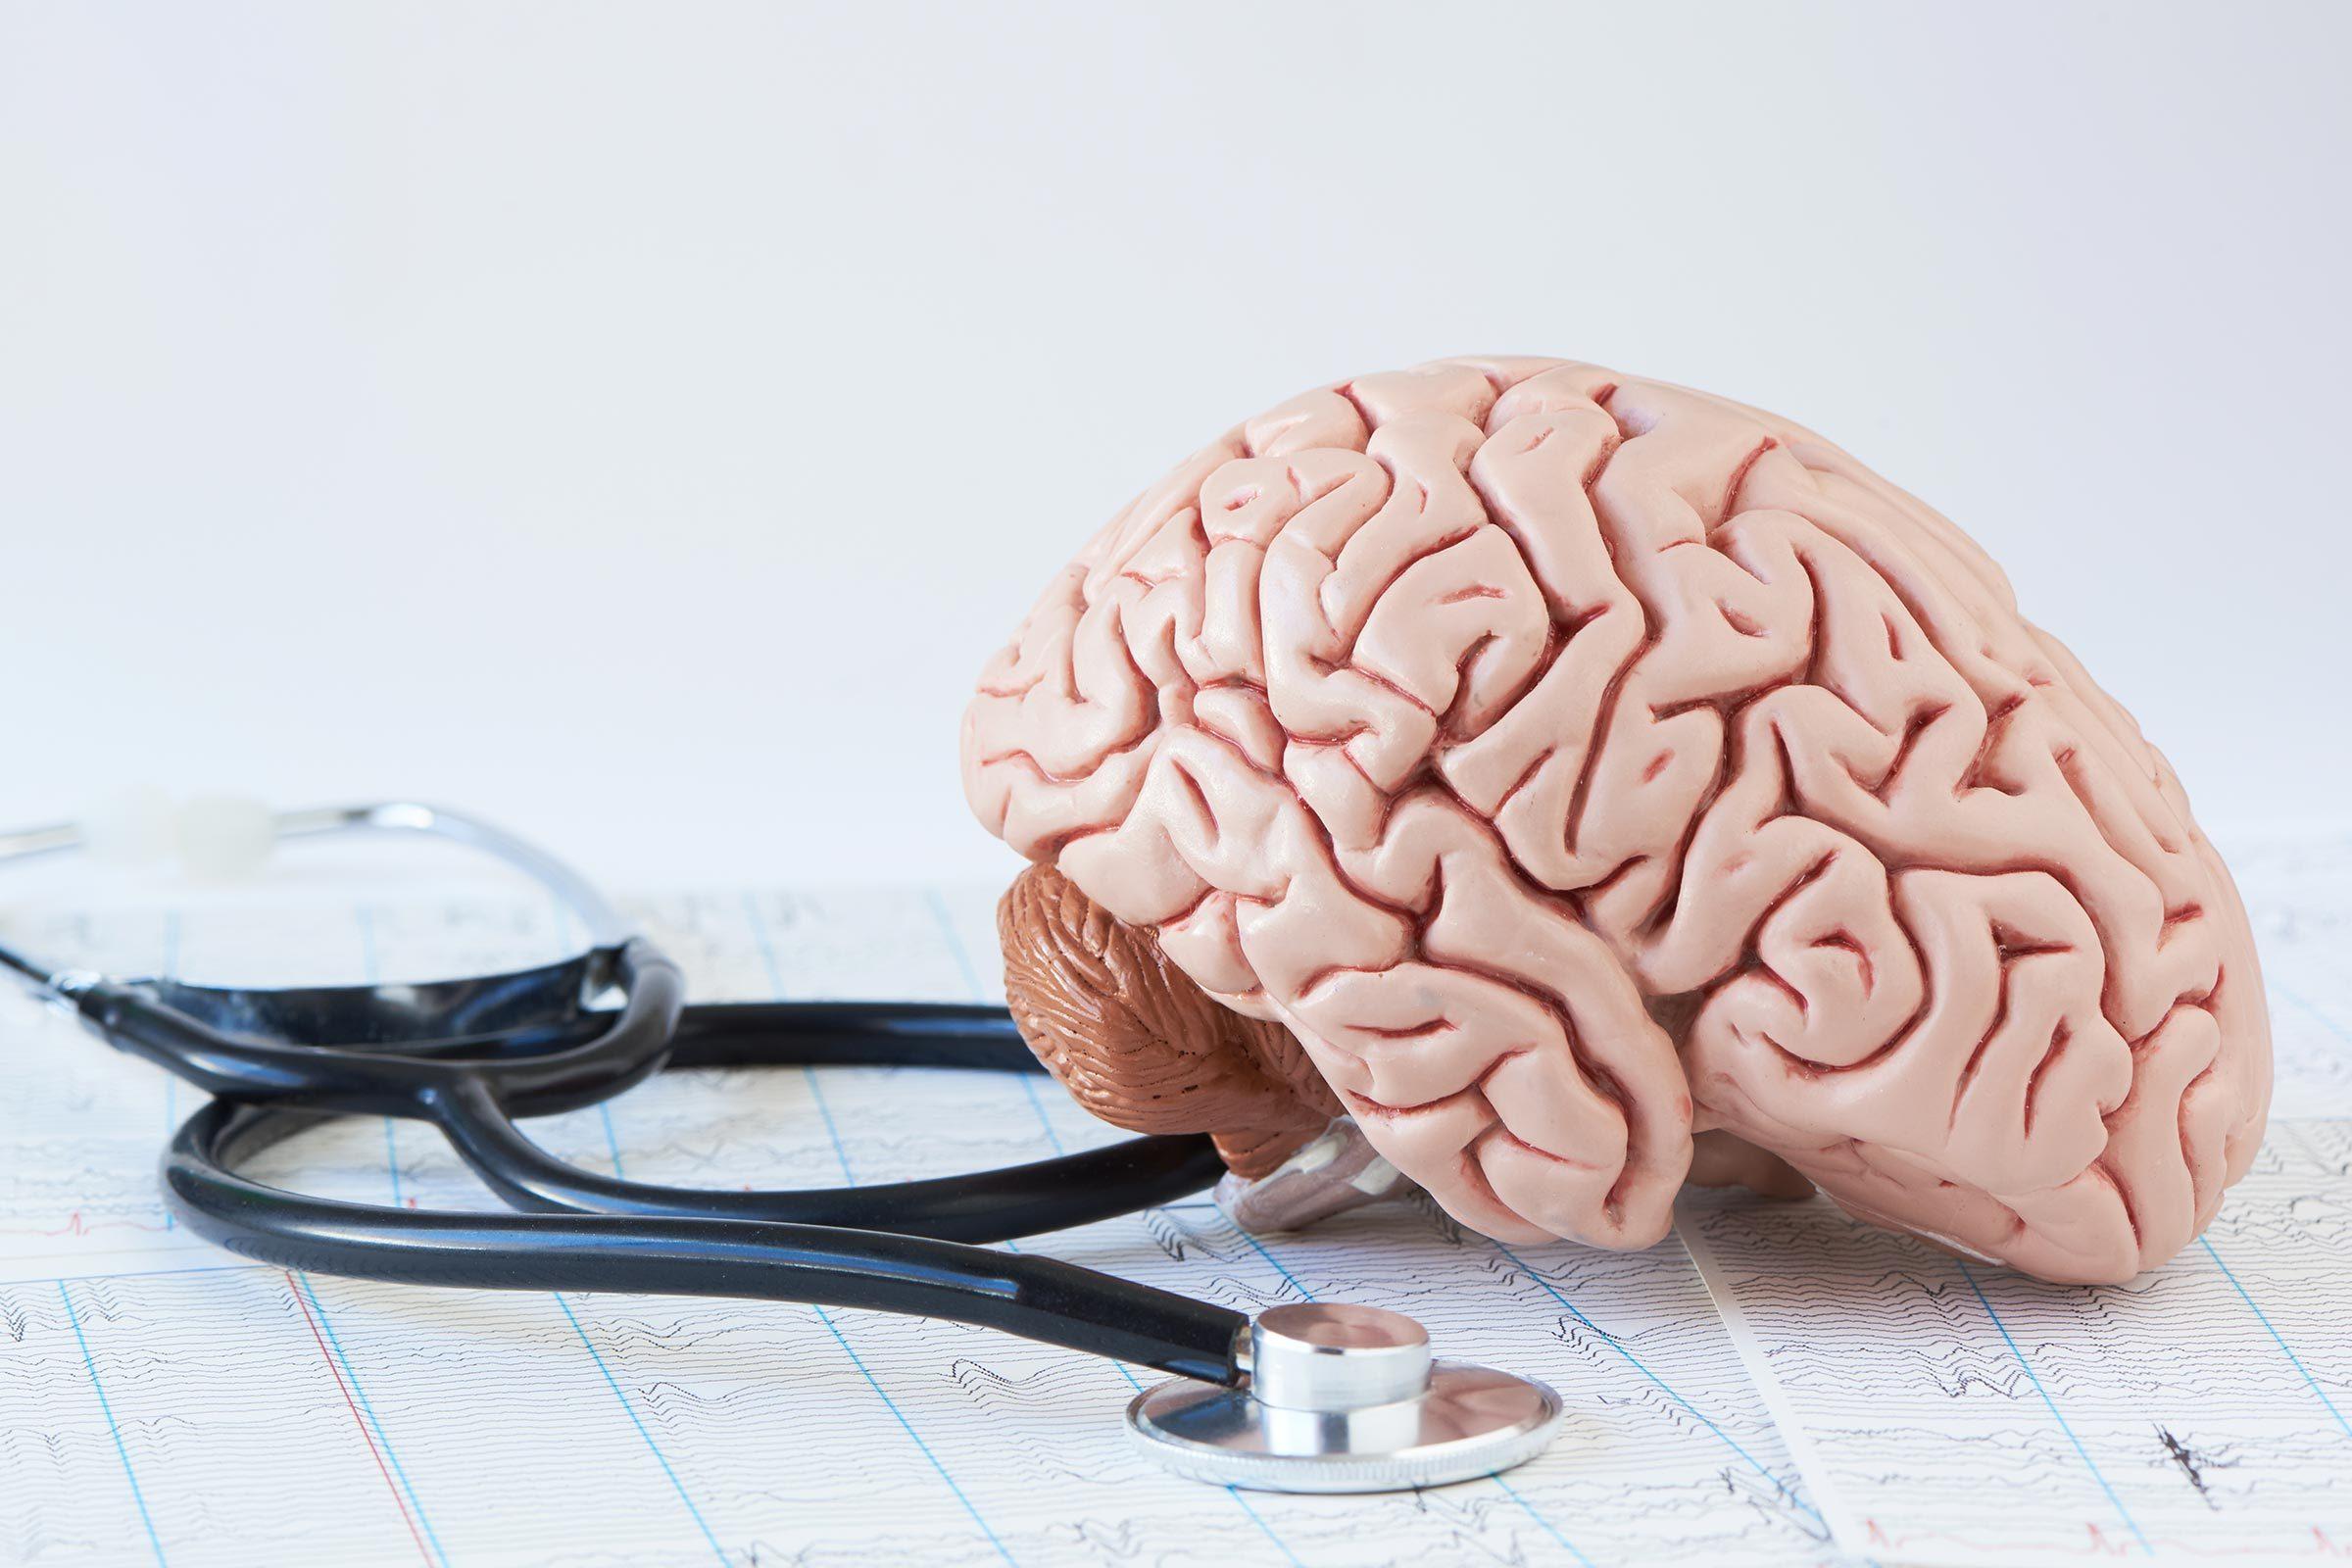 brain anatomical figure stethoscope